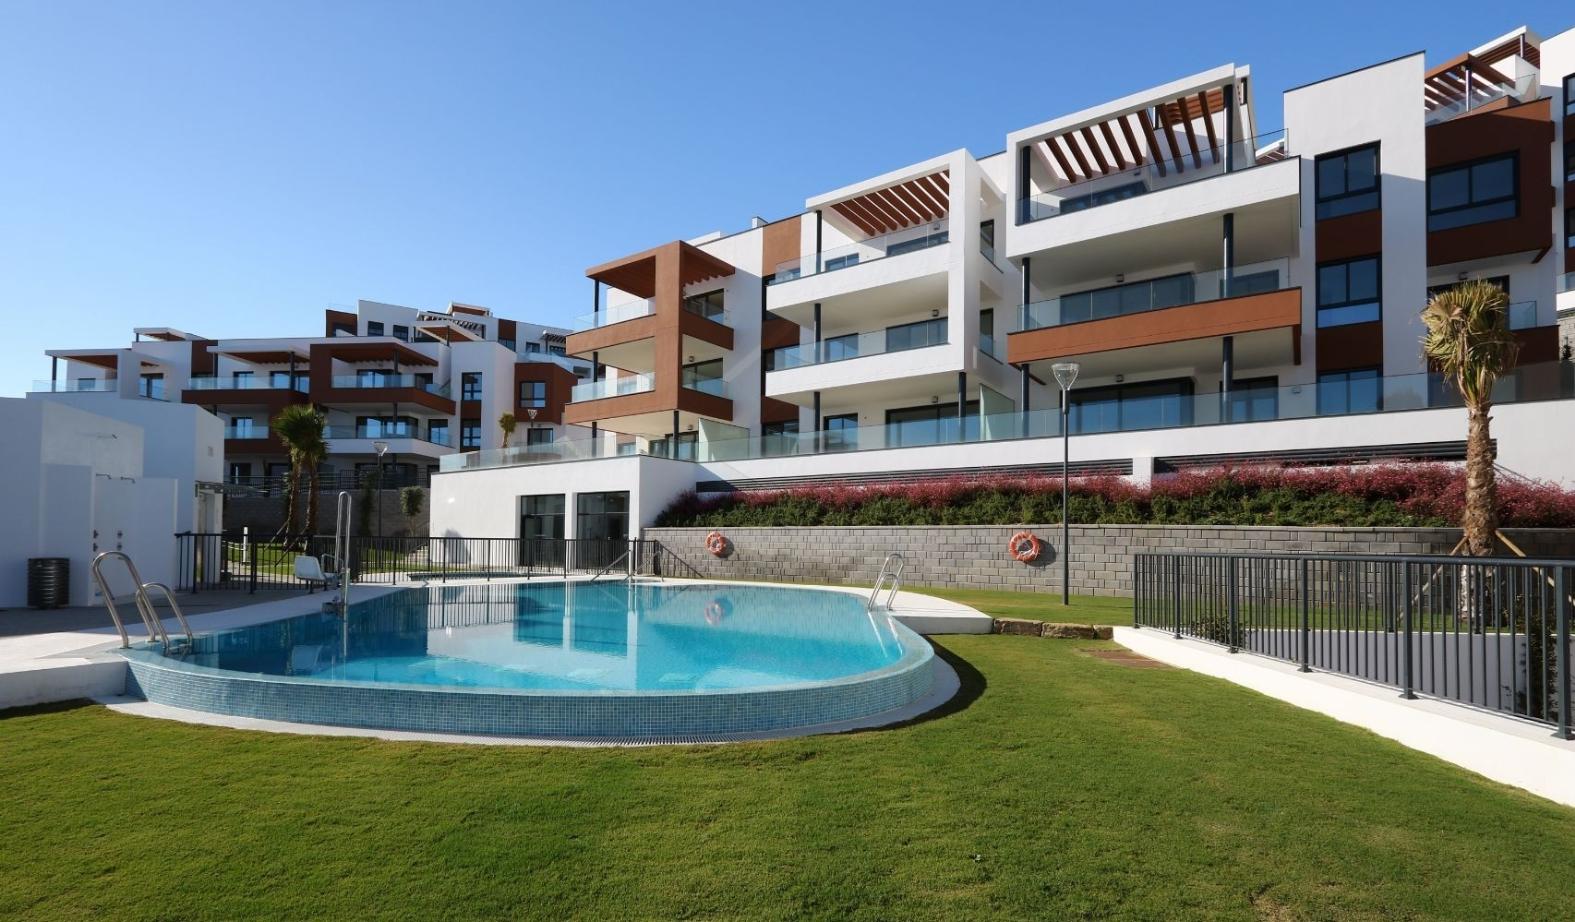 Pool area - complex 3